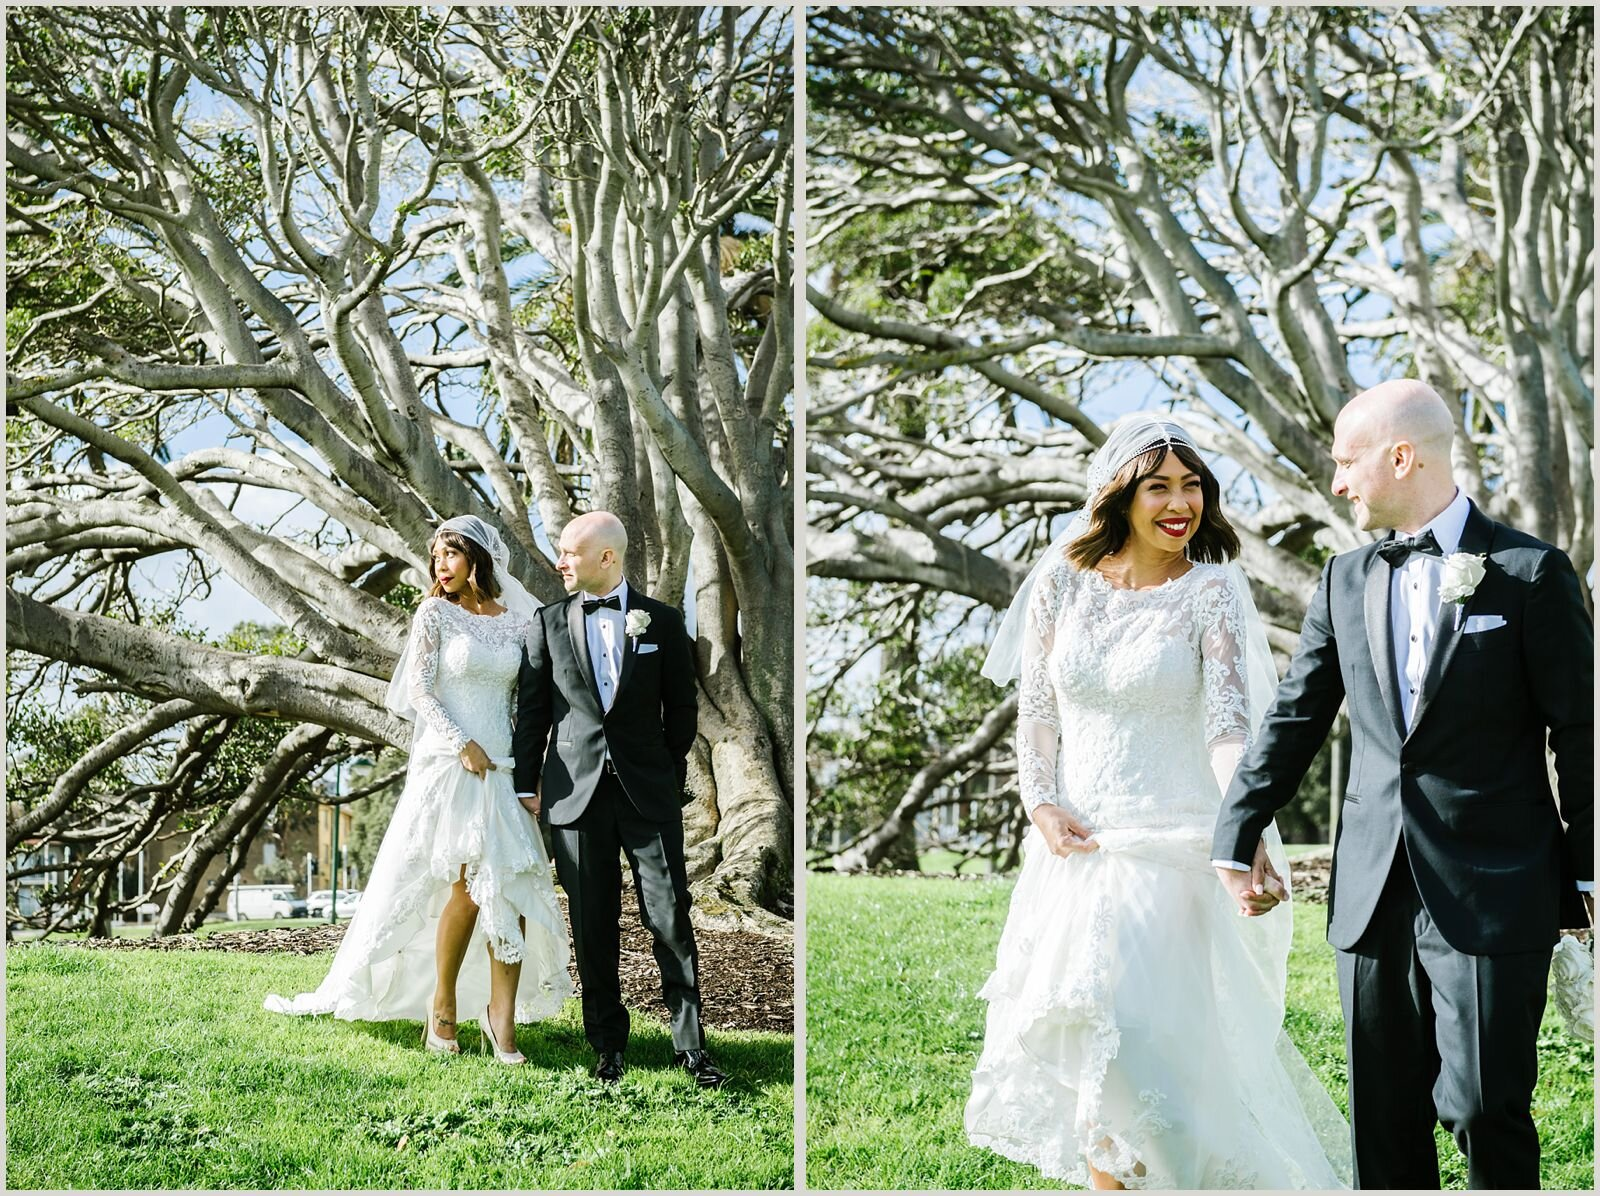 joseph_koprek_wedding_melbourne_the_prince_deck_0028.jpg